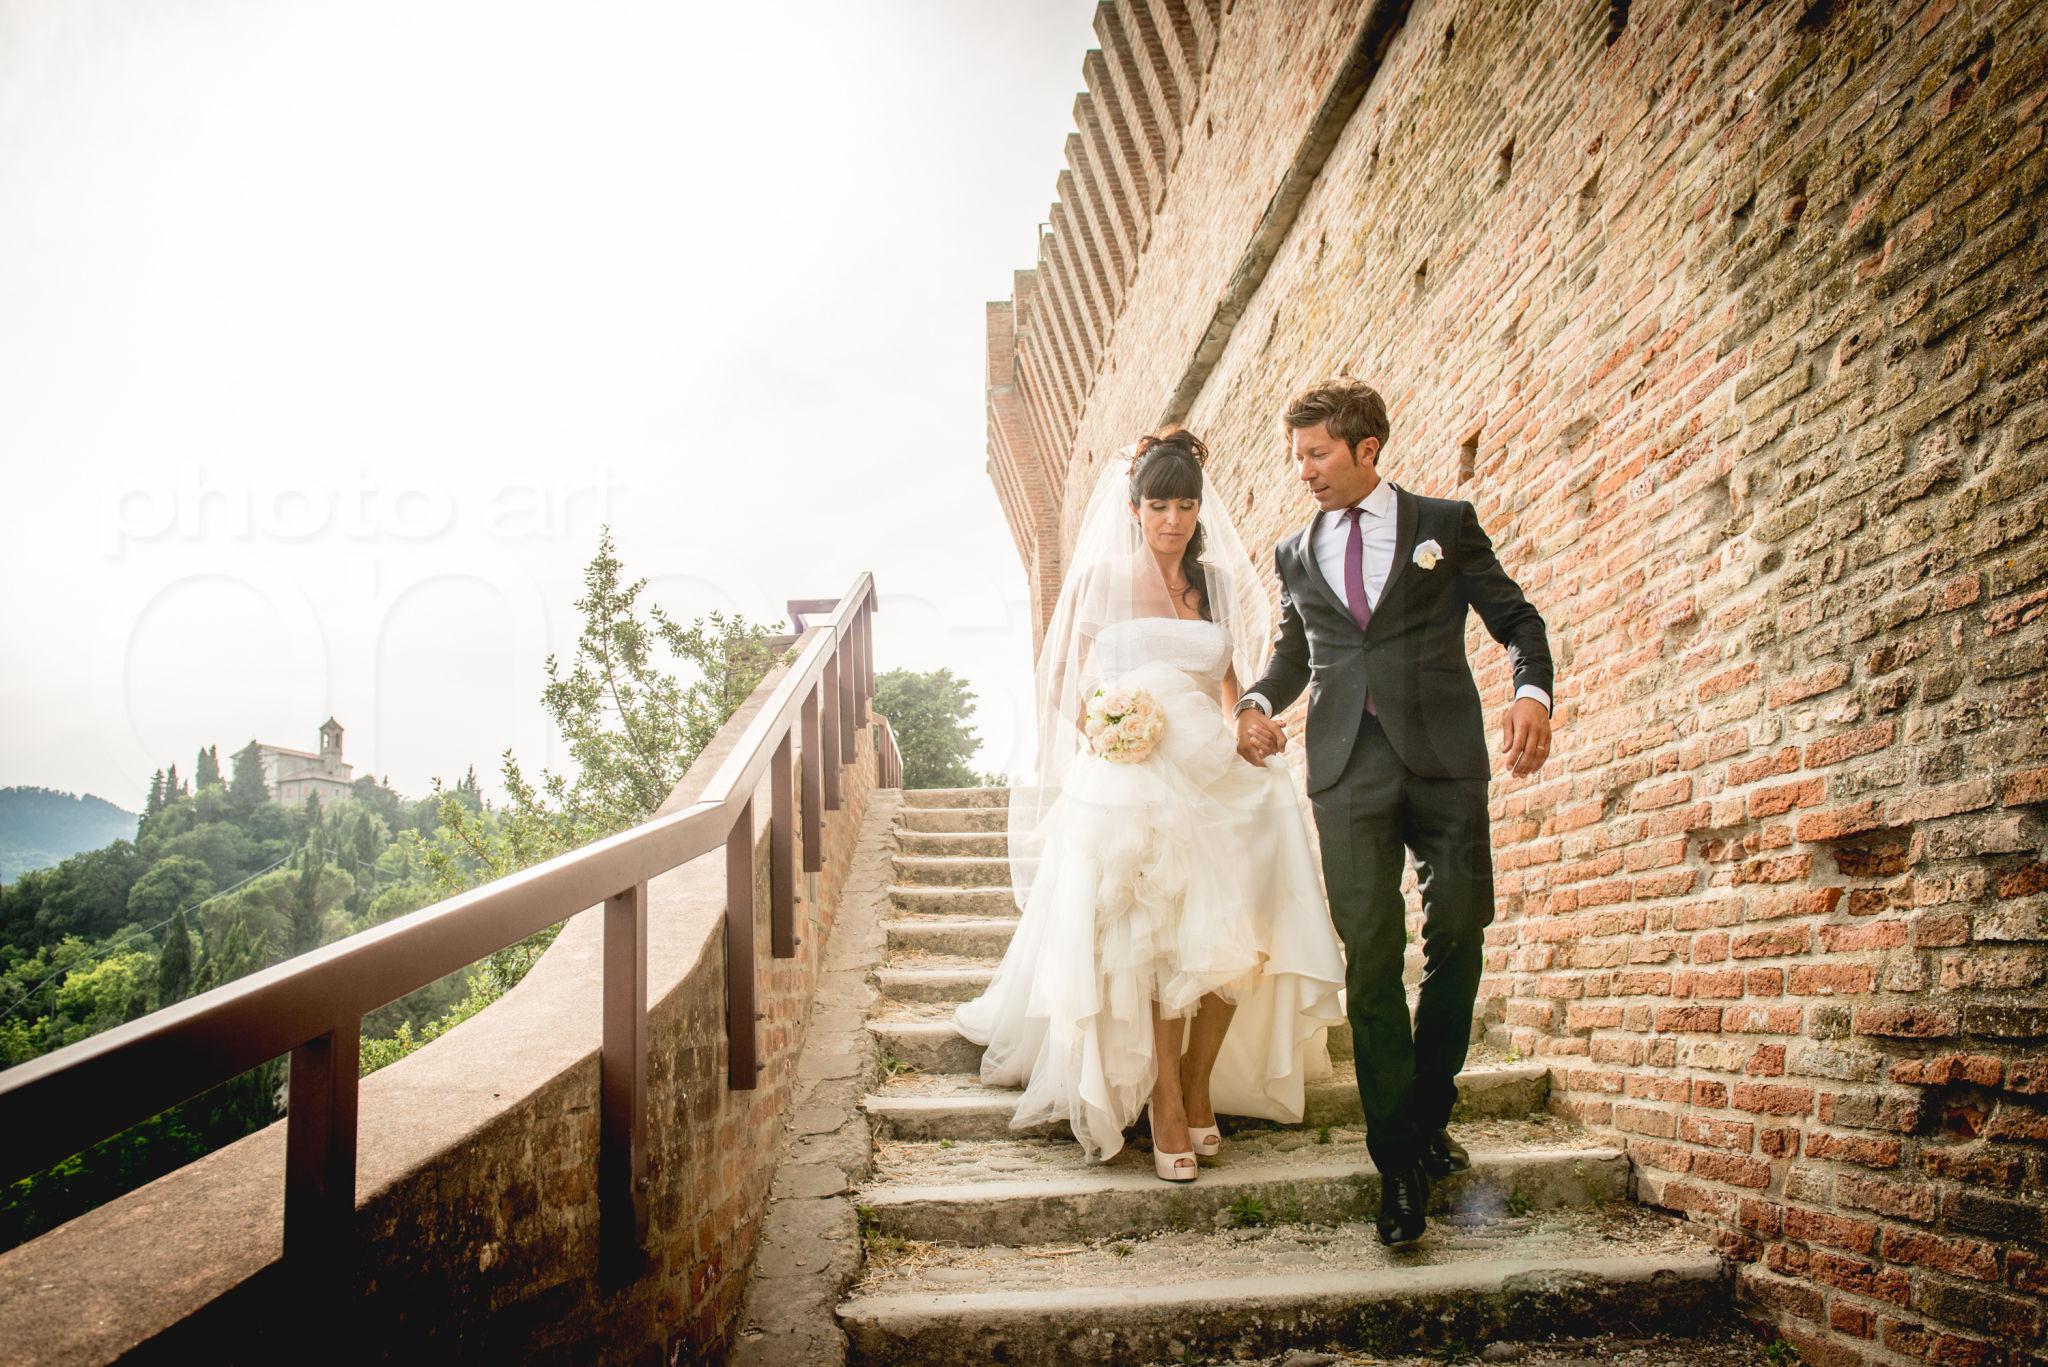 https://lnx.mirkone.it/wp-content/uploads/2015/07/fotografo-matrimoni-faenza-0020.jpg